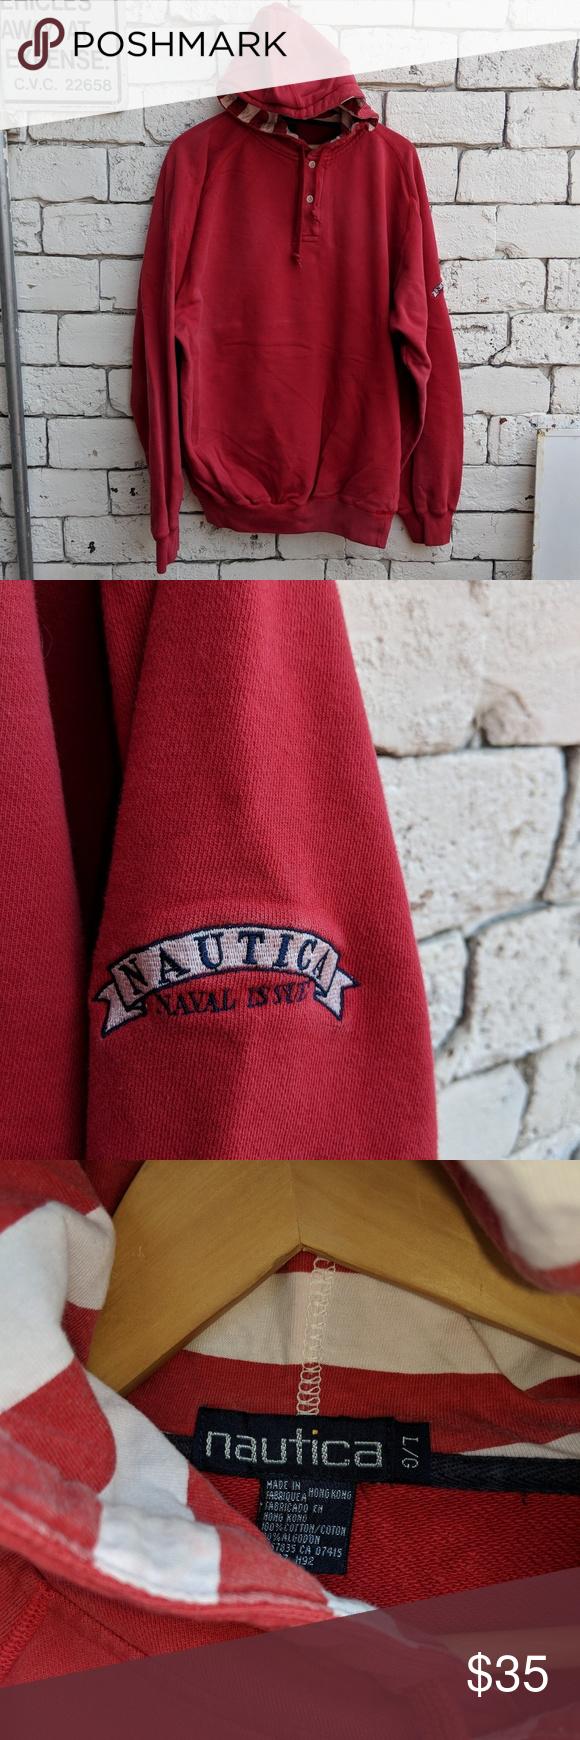 Vintage Nautica Hoodie My Posh Closet Pinterest Polos Hodie Size L Pit To 245 Sleeve 26 Length Collar Bottom 27 90s Polo